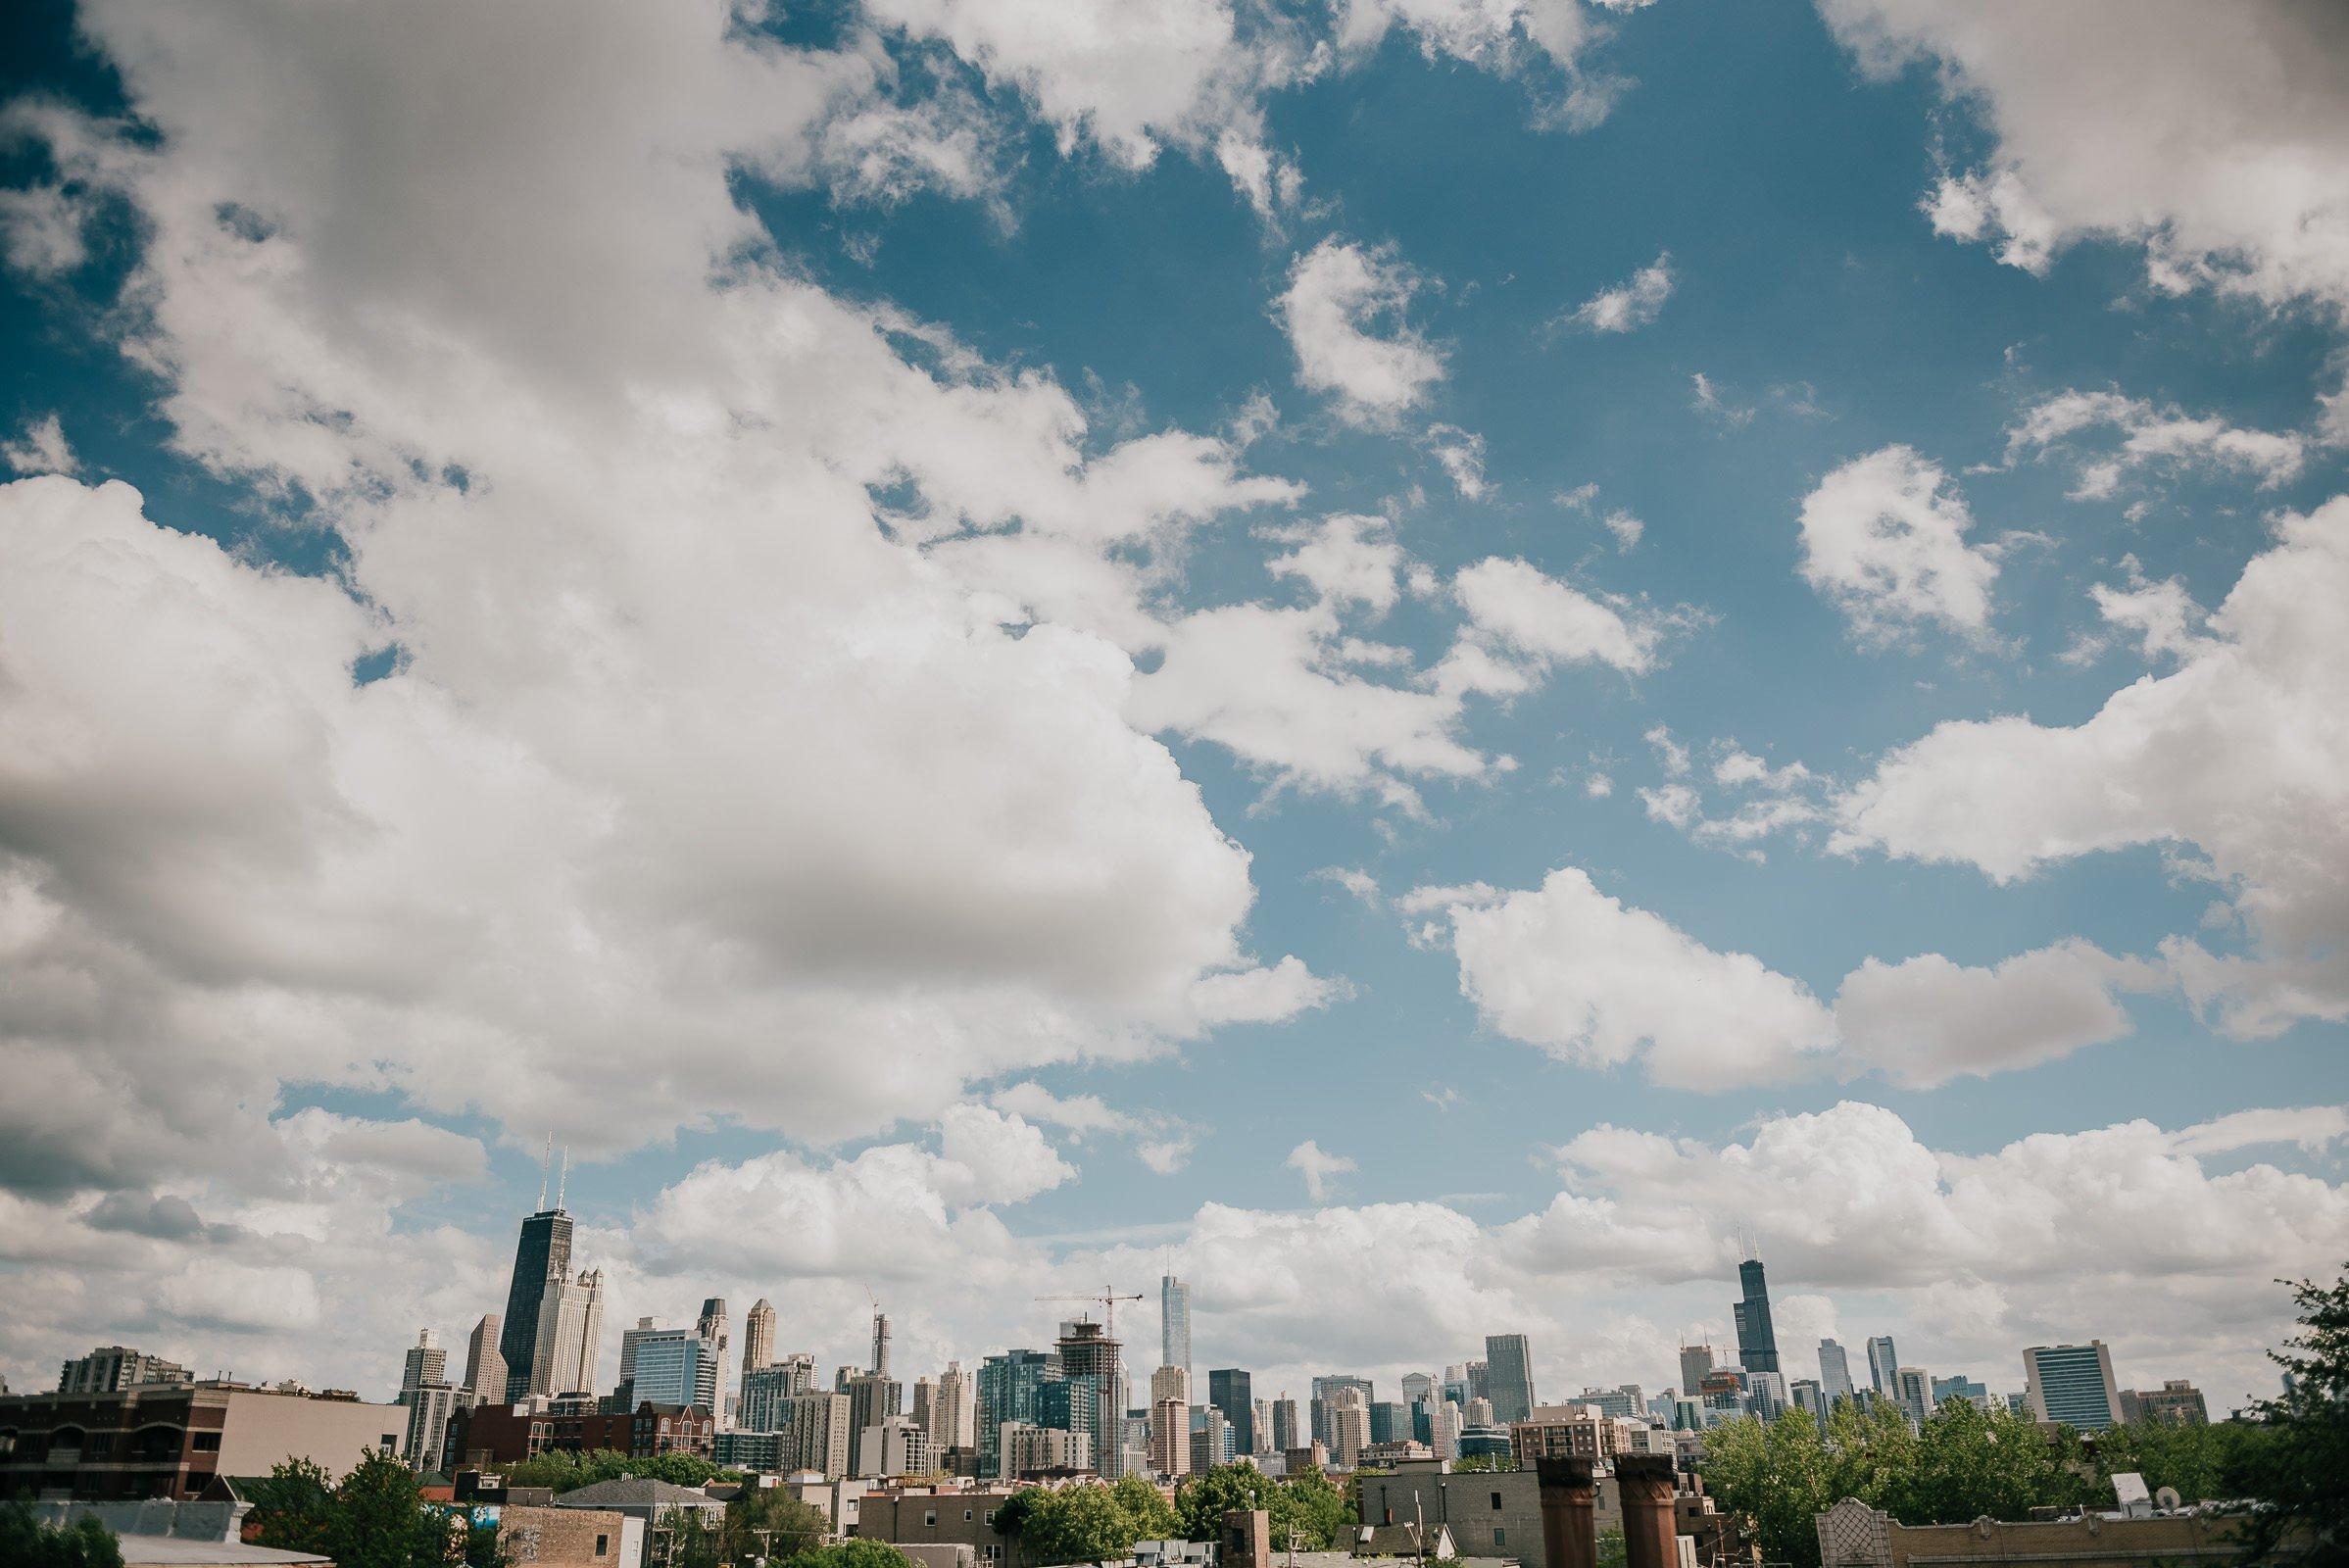 travel photography, chicago, illinois